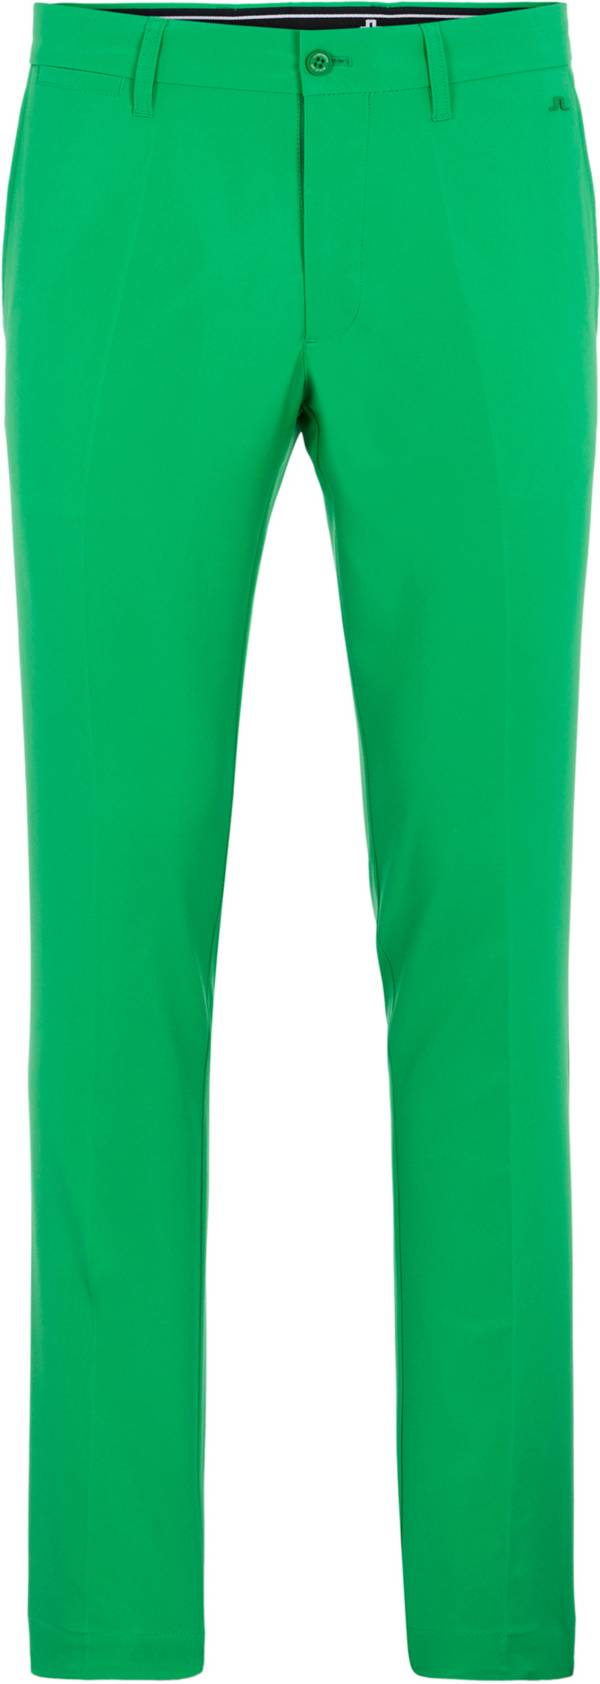 J.Lindeberg Men's Ellott Micro Stretch Tight Golf Pants product image